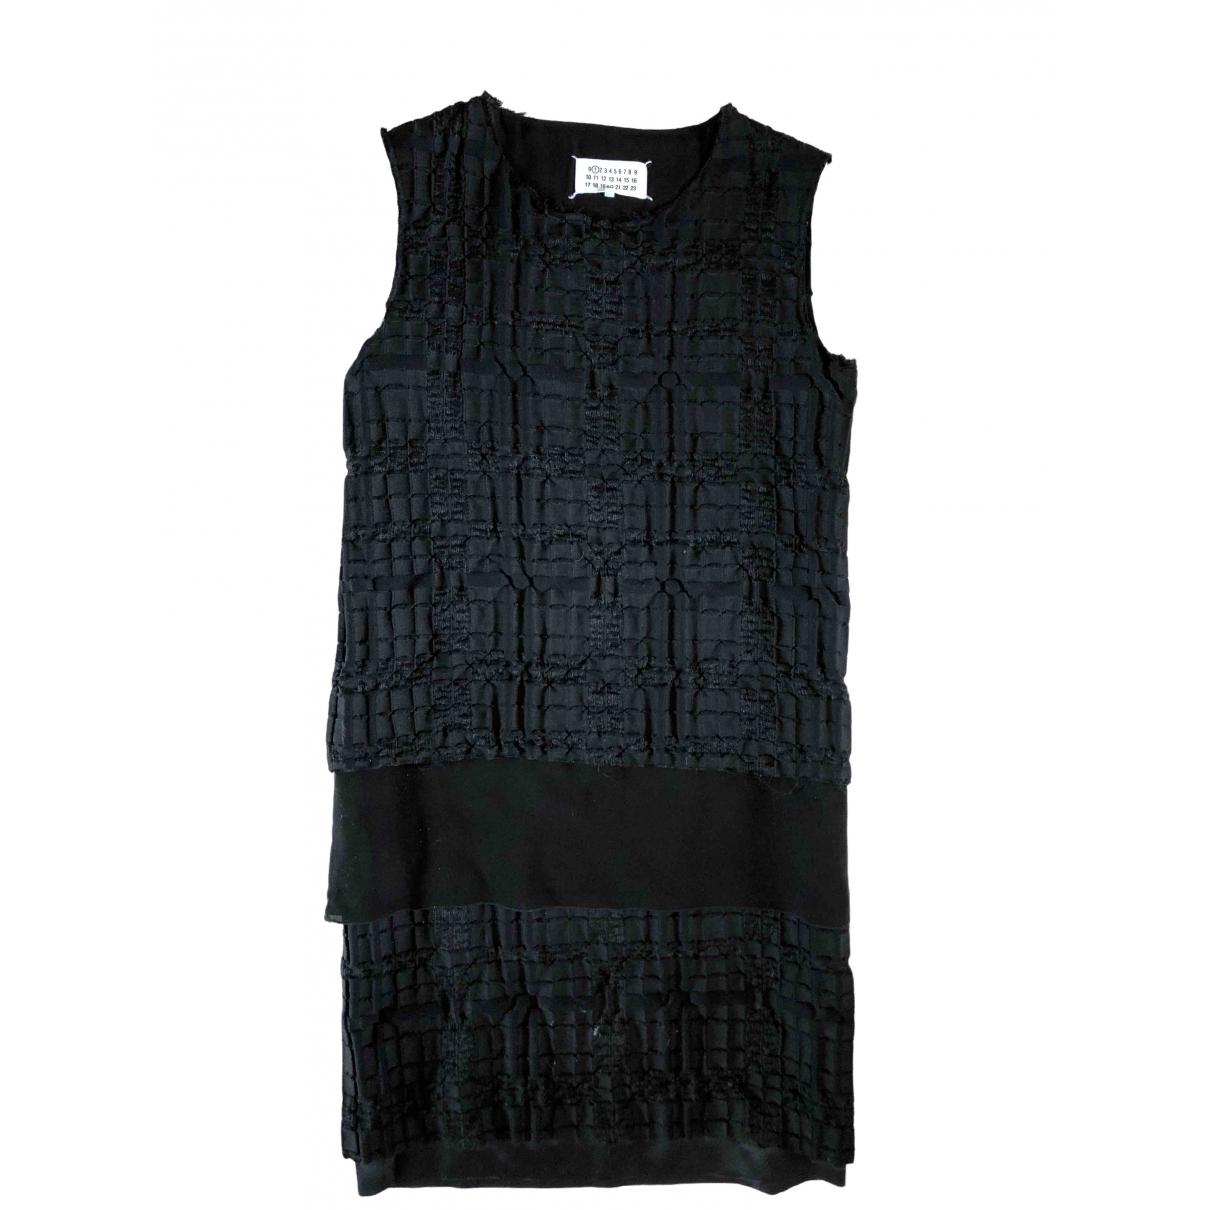 Maison Martin Margiela \N Black Cotton dress for Women 40 IT